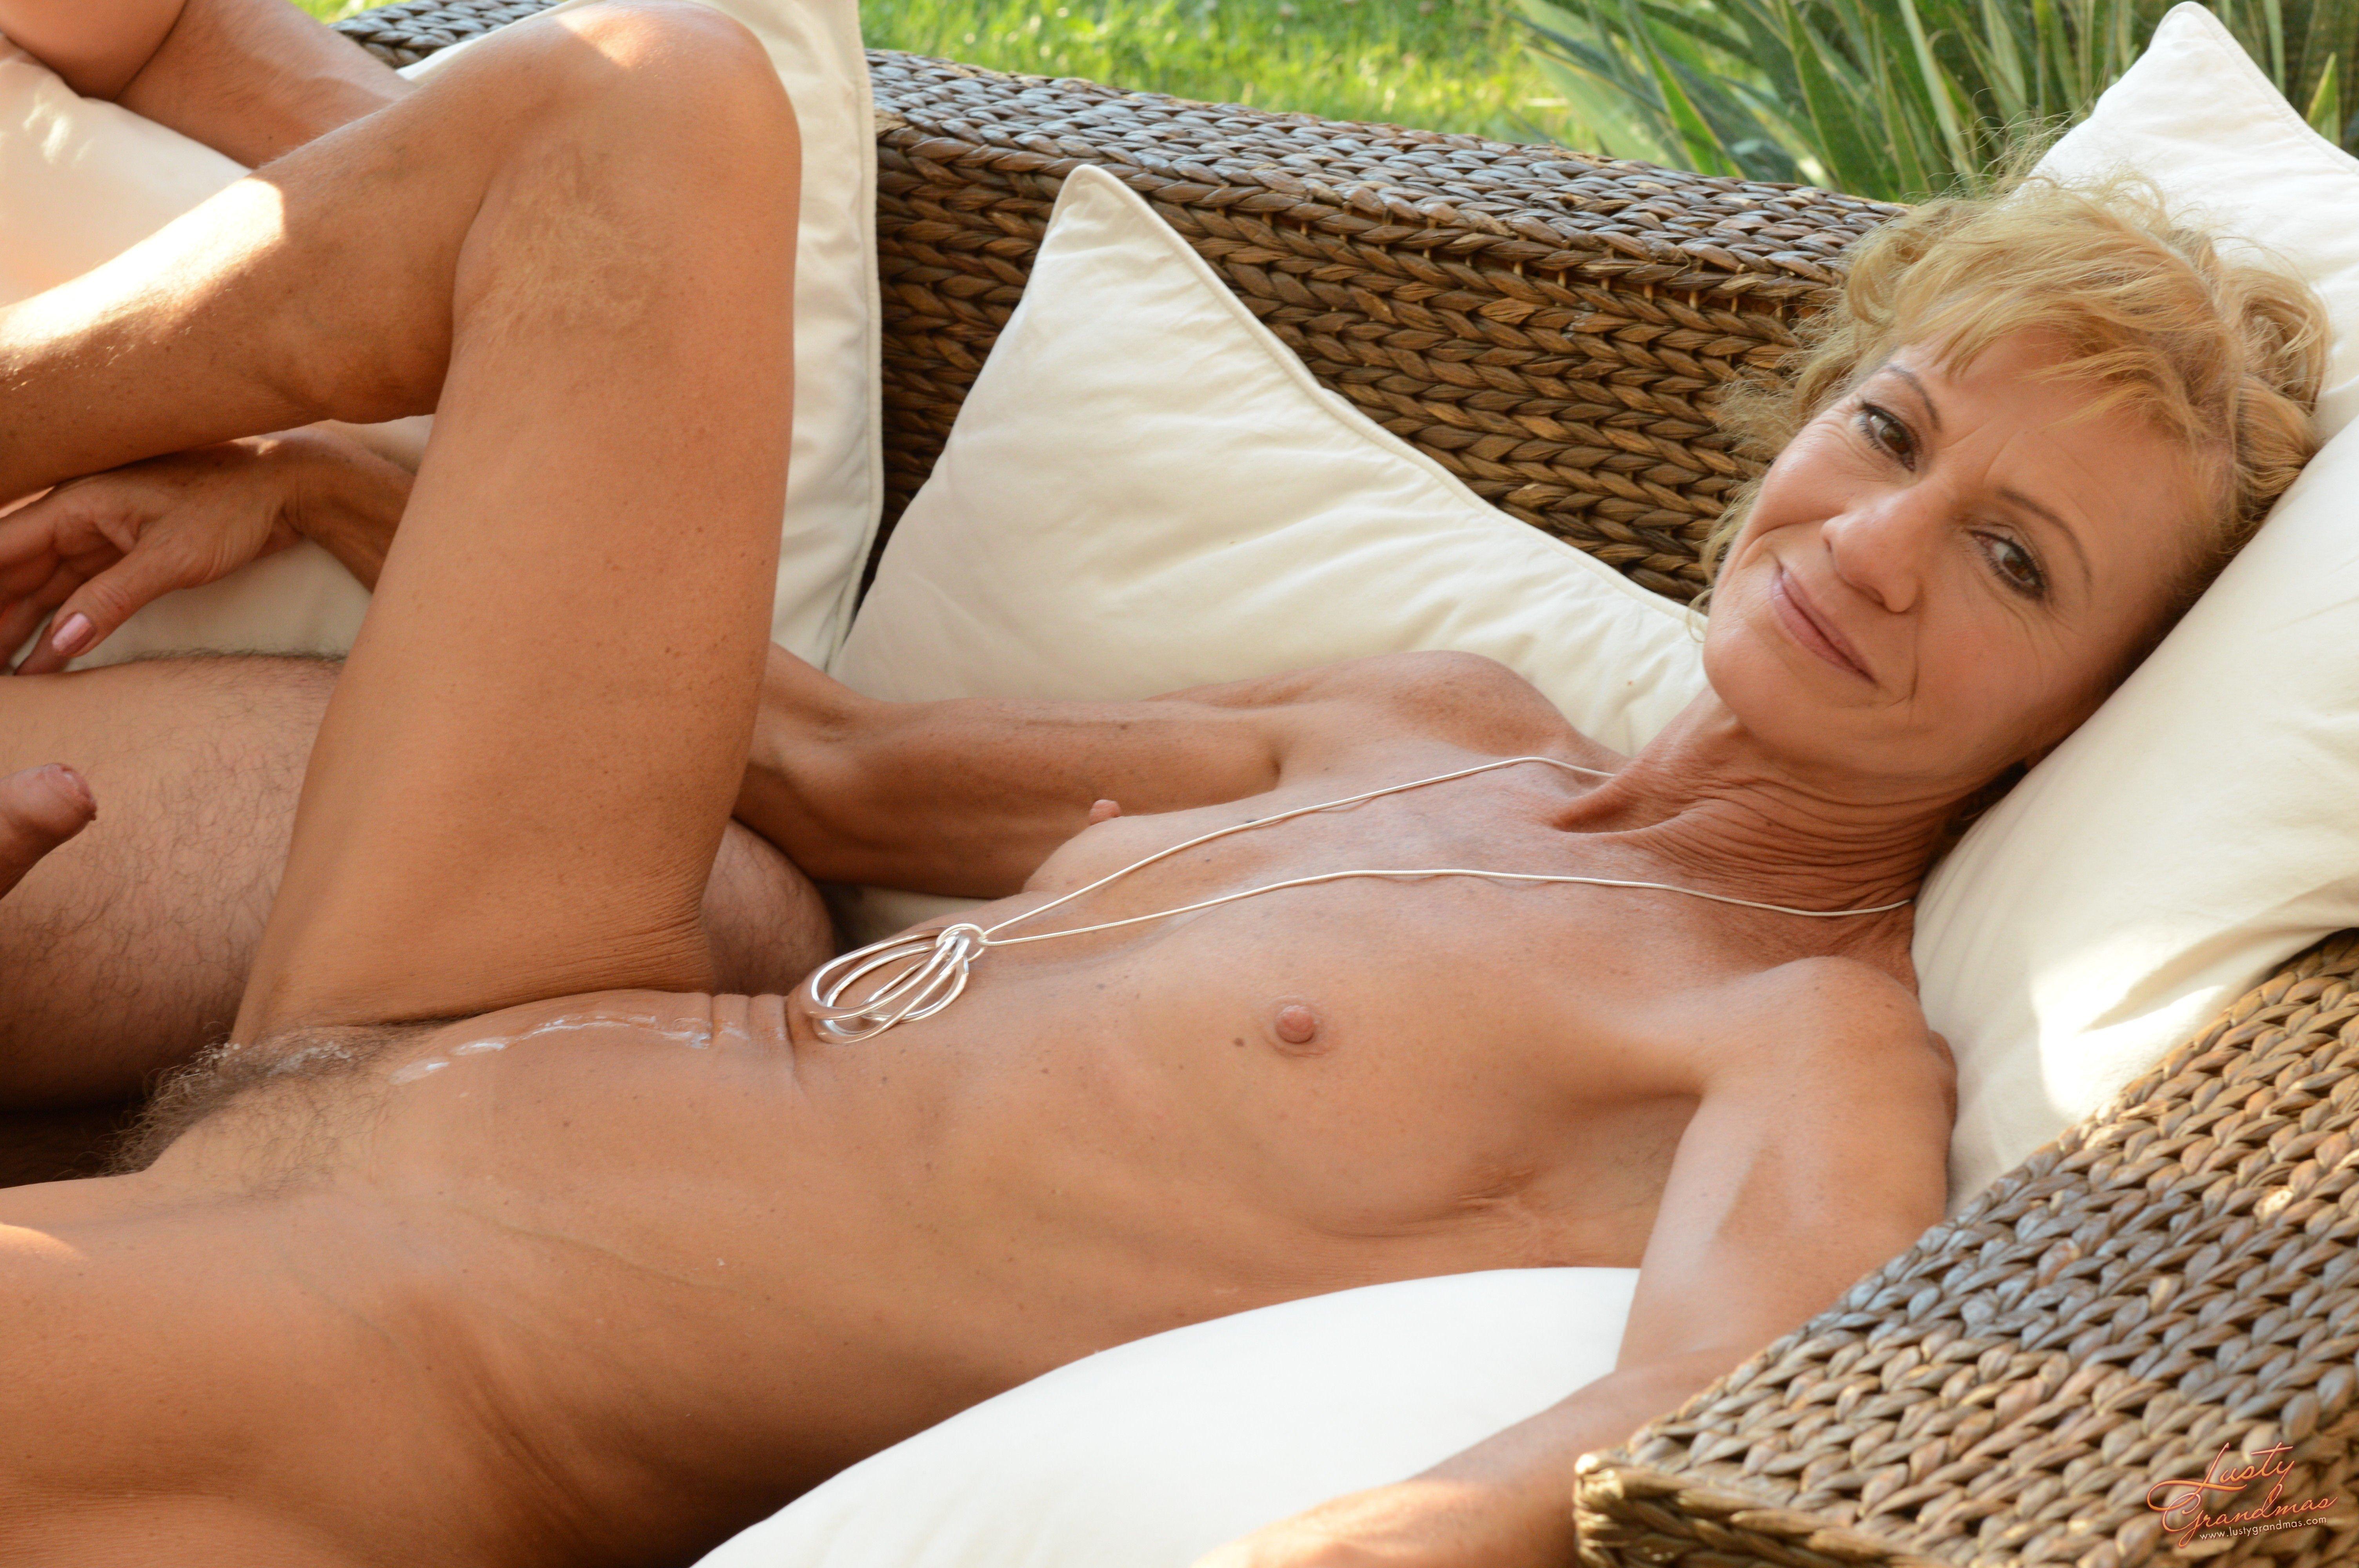 Skinny mature hot sex